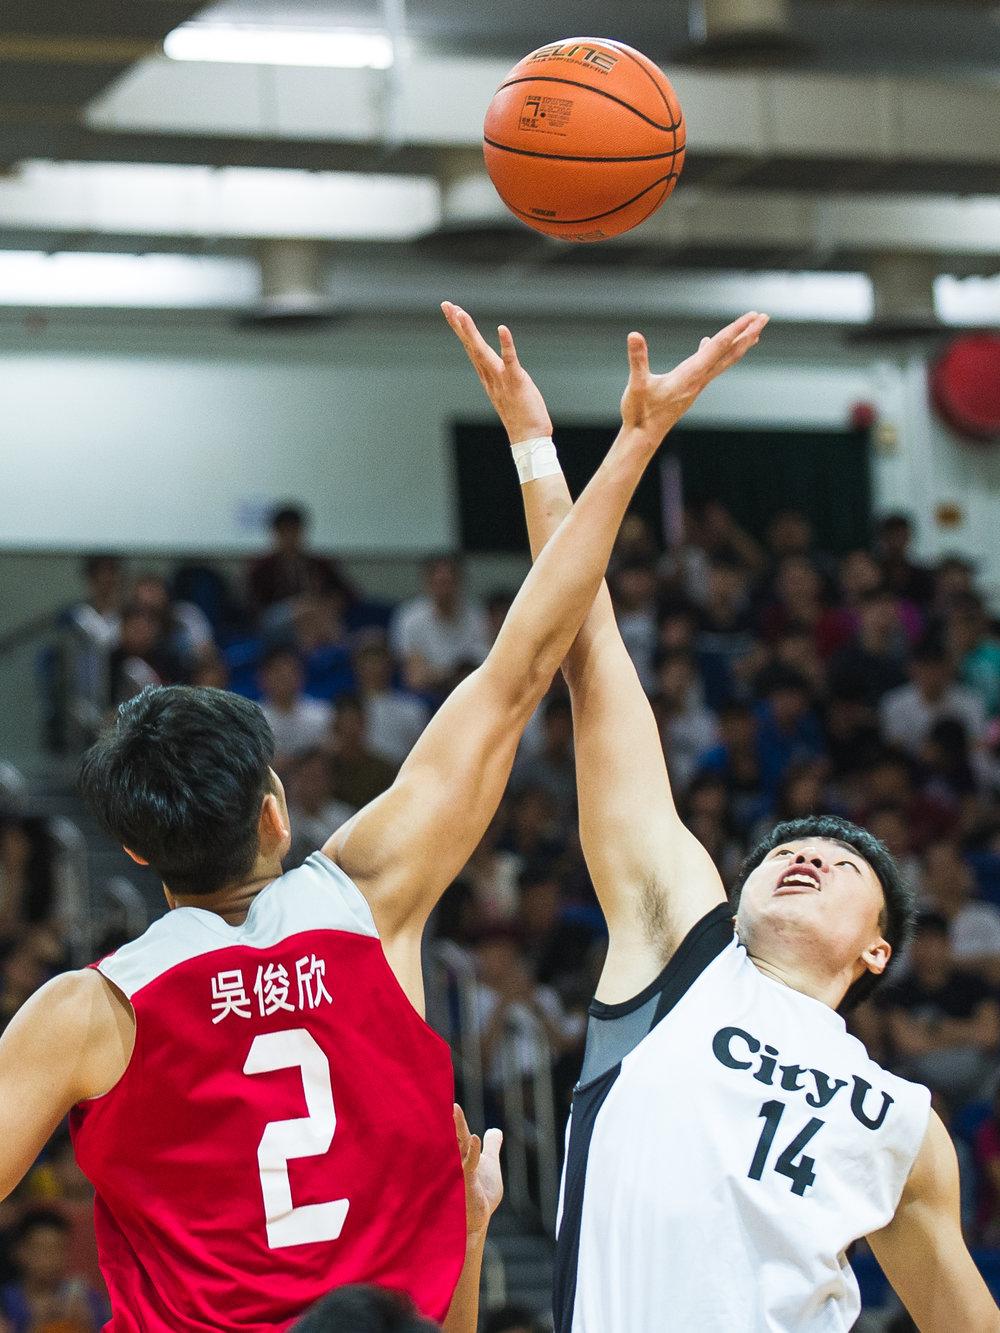 20160417-basketball-7.jpg